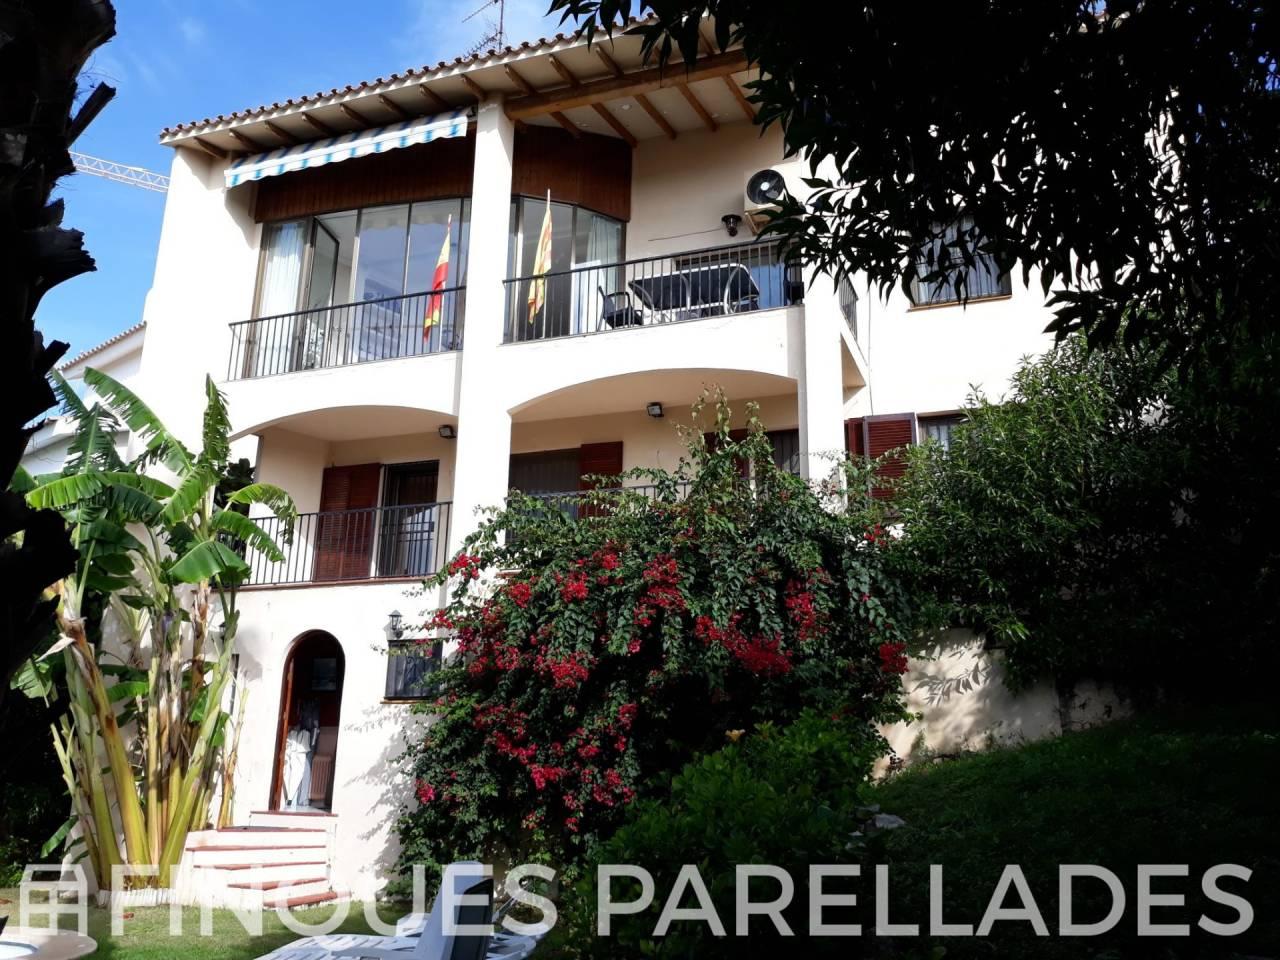 House for rent in Vallpineda-Santa Bàrbara